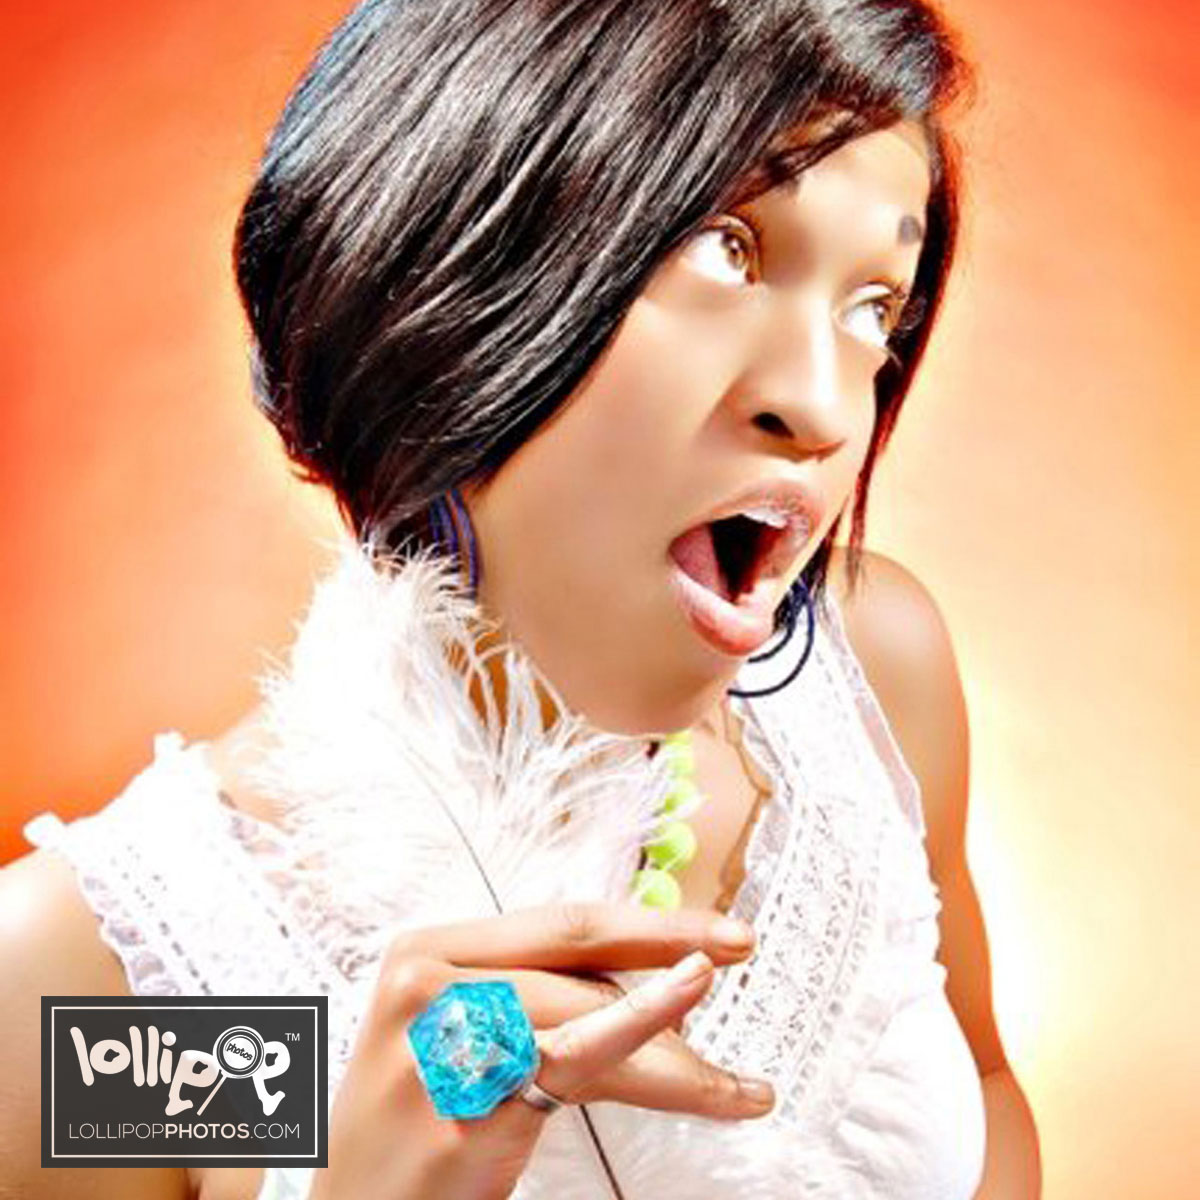 msdig-nora-canfield-lollipop-photos-147.jpg